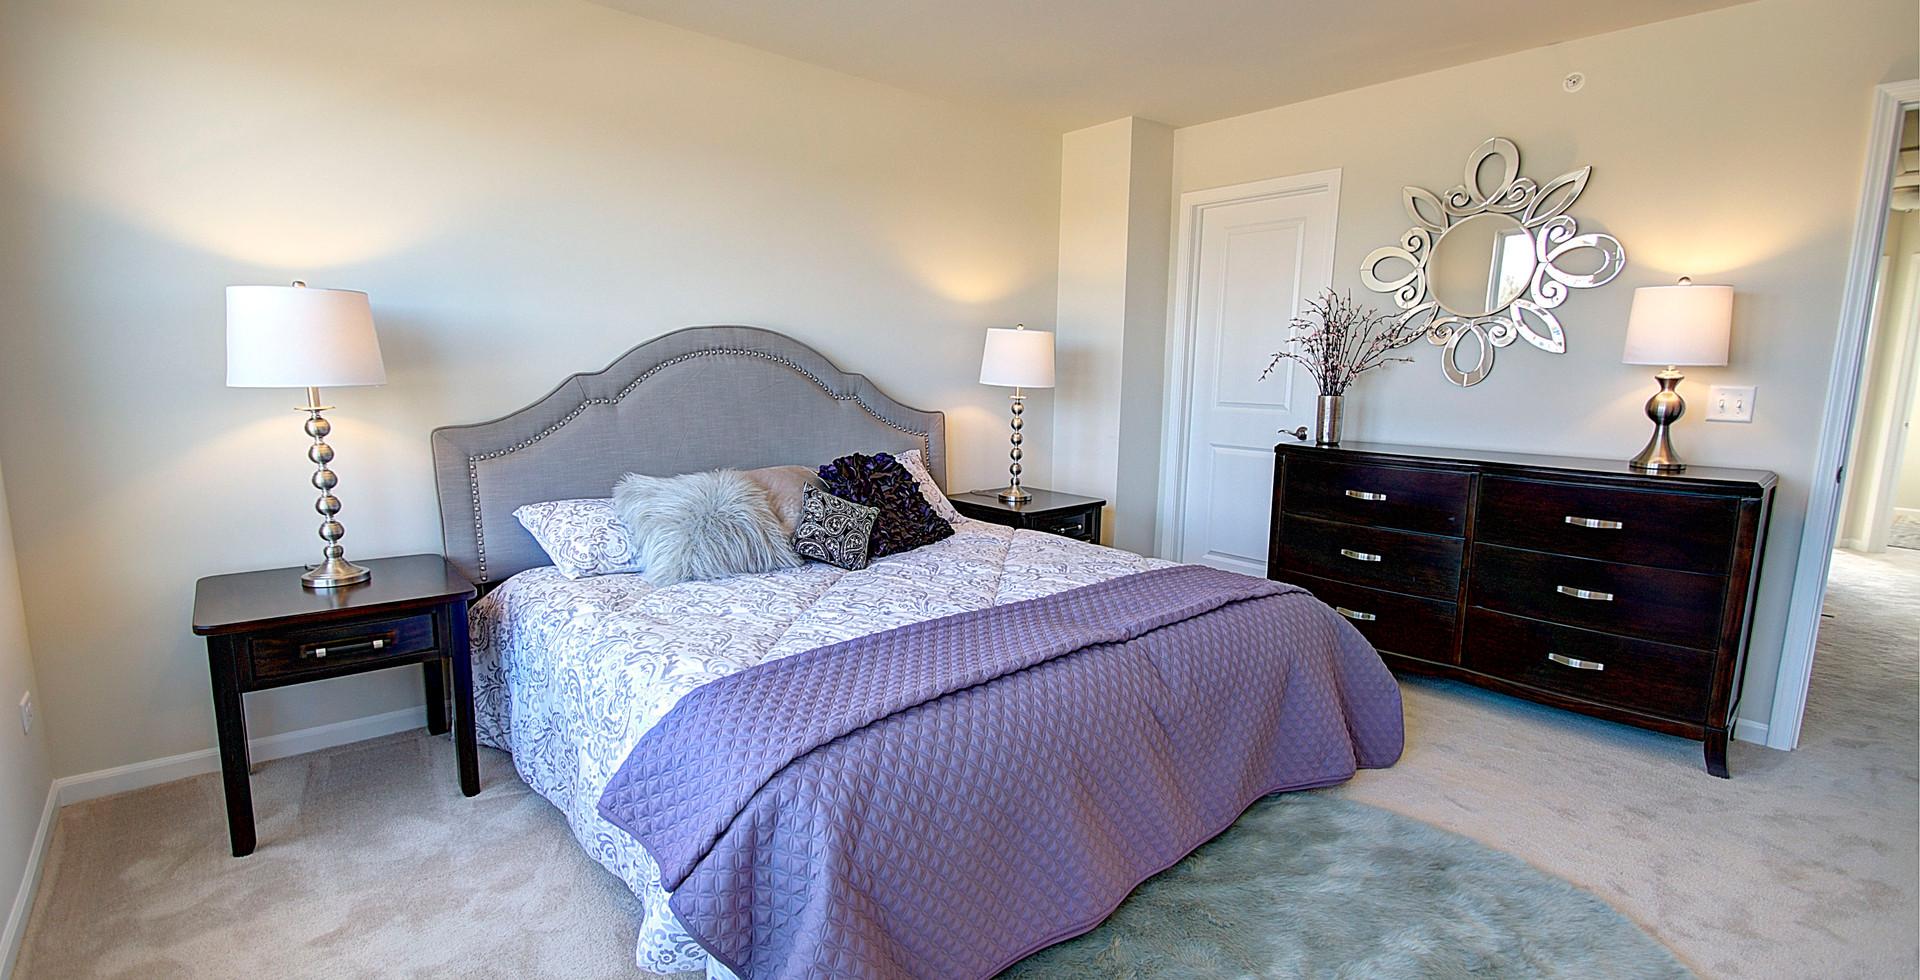 Bedroom in Downers Grove designed by MRM Home Design.jpg